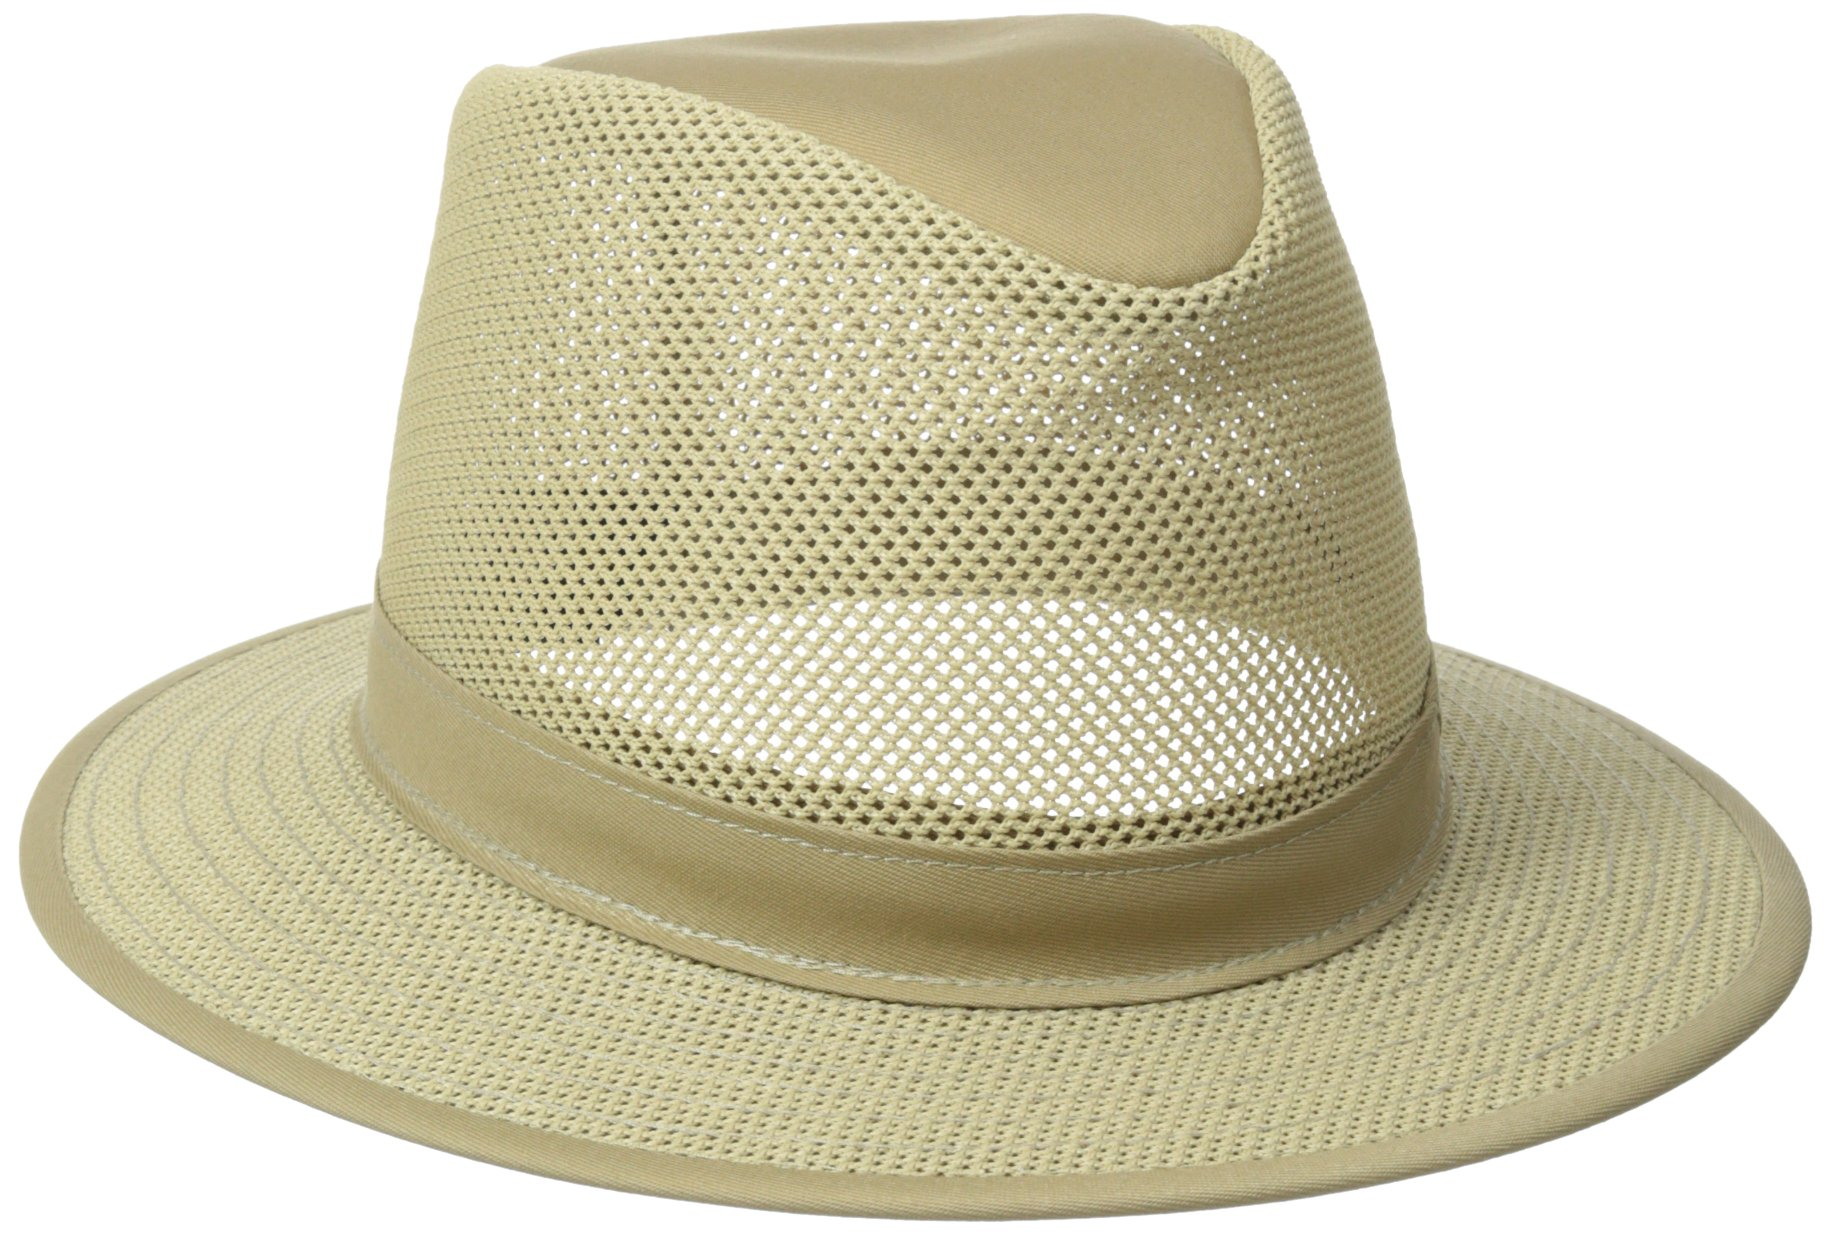 Henschel Safari Packable Breezer Hat, Khaki, Medium